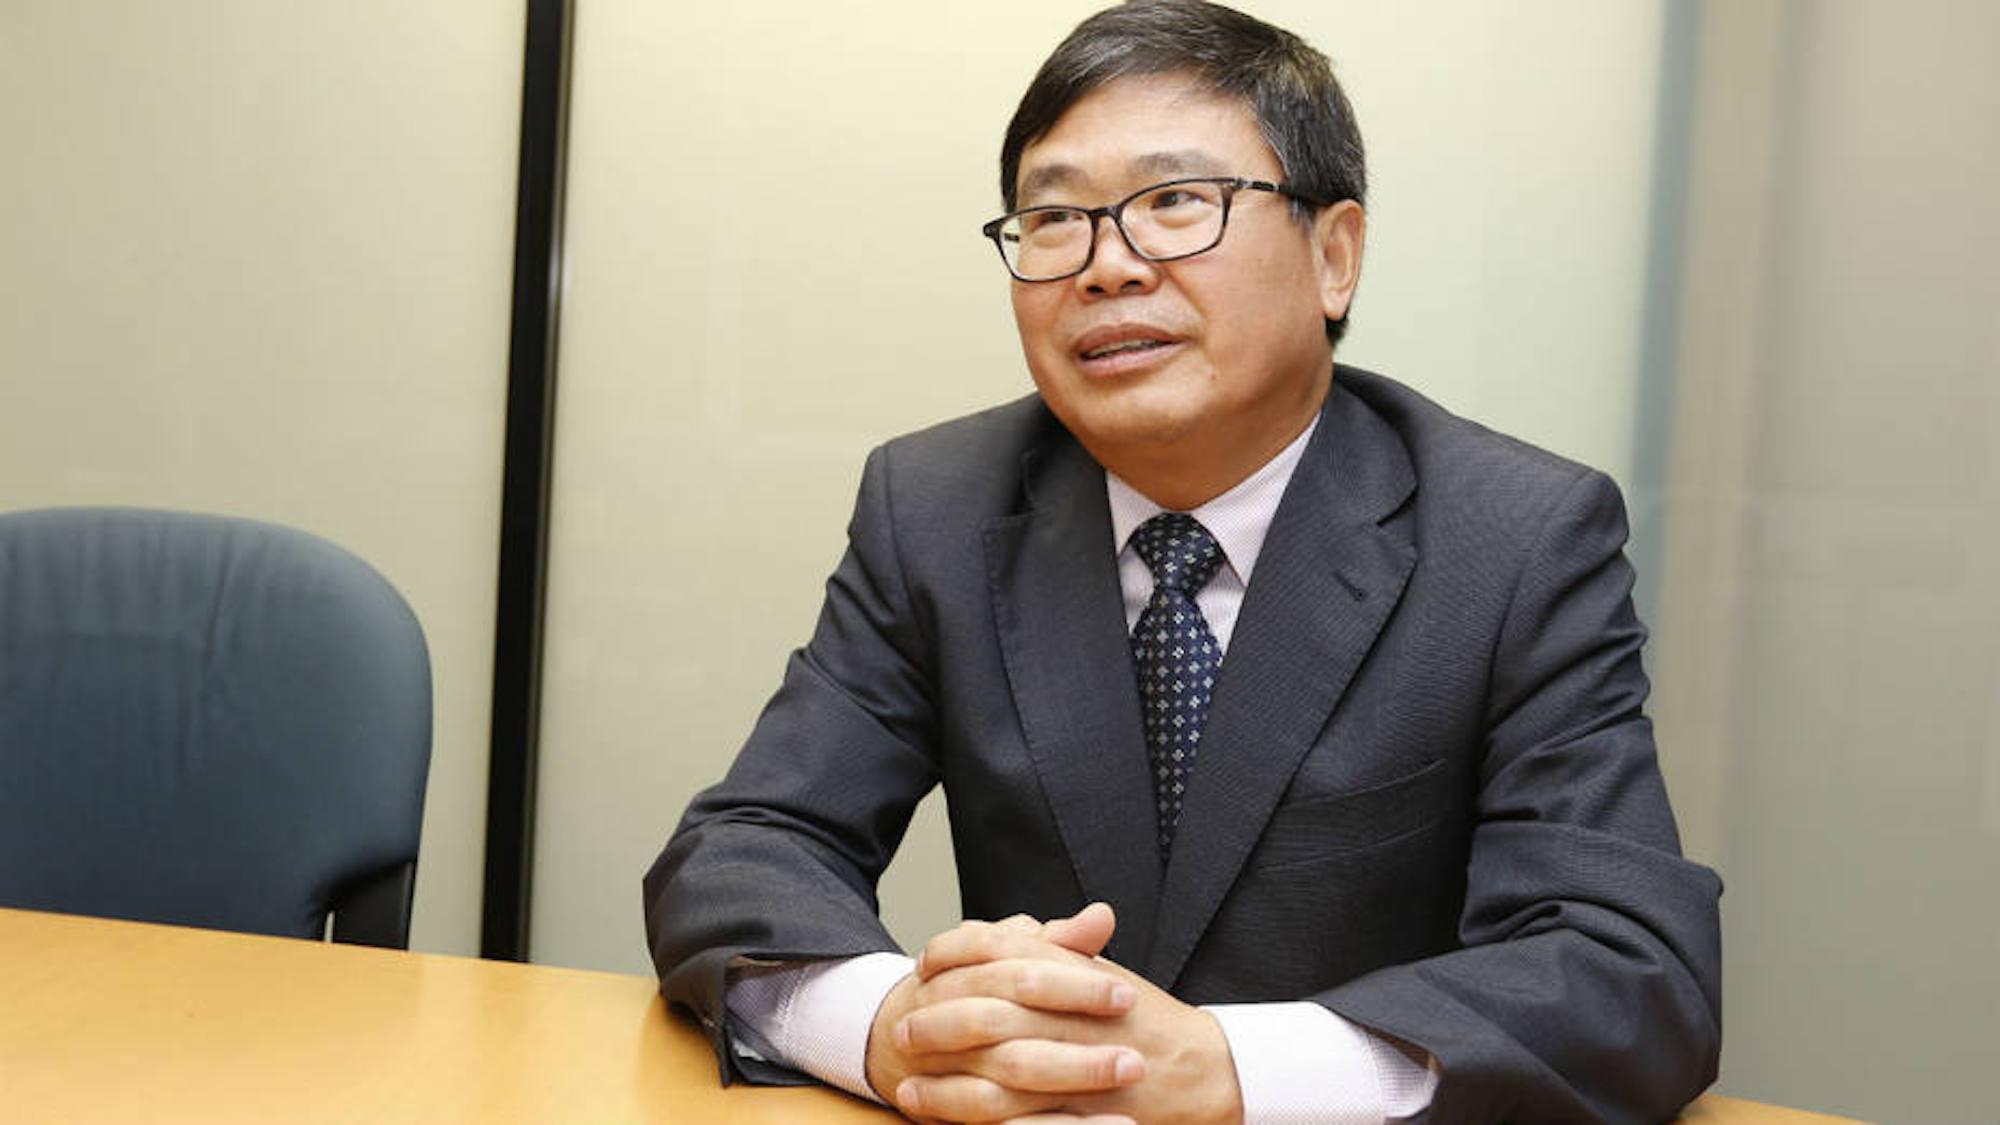 Chinese Ambassador to Portugal Zhao Bentang